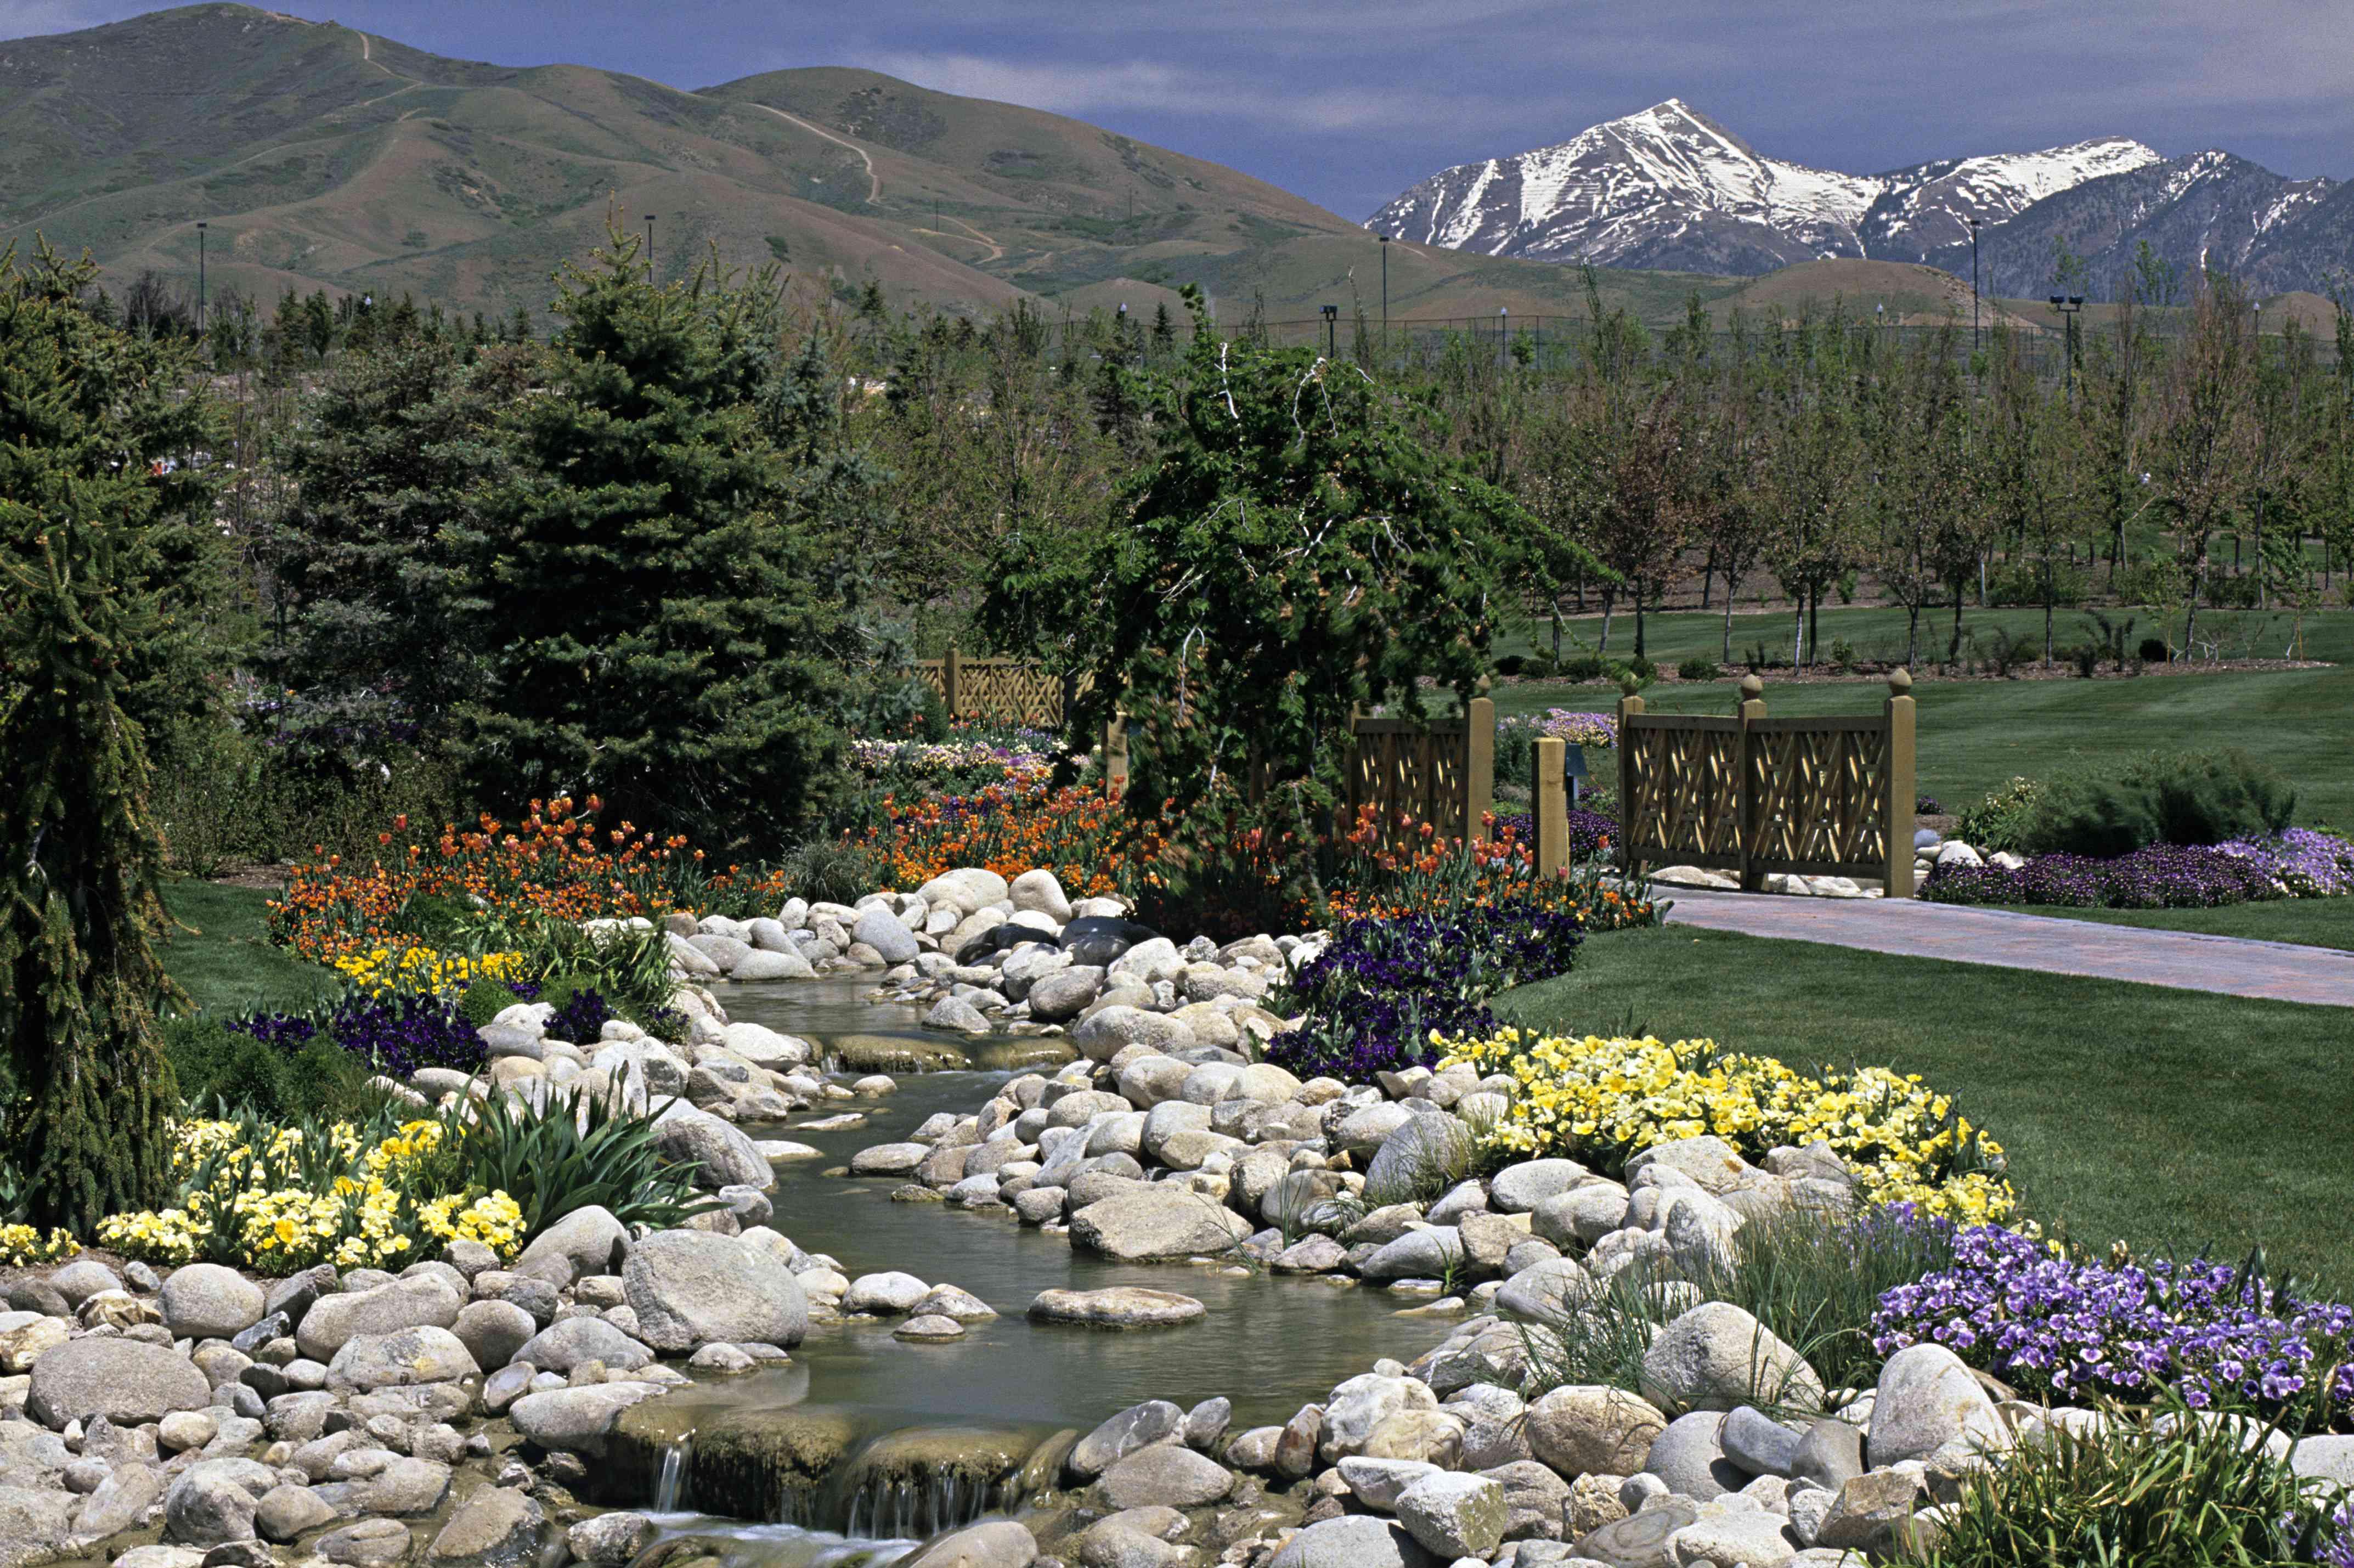 Thanksgiving gardens. Thanksgiving point, Utah (near Salt Lake City). USA